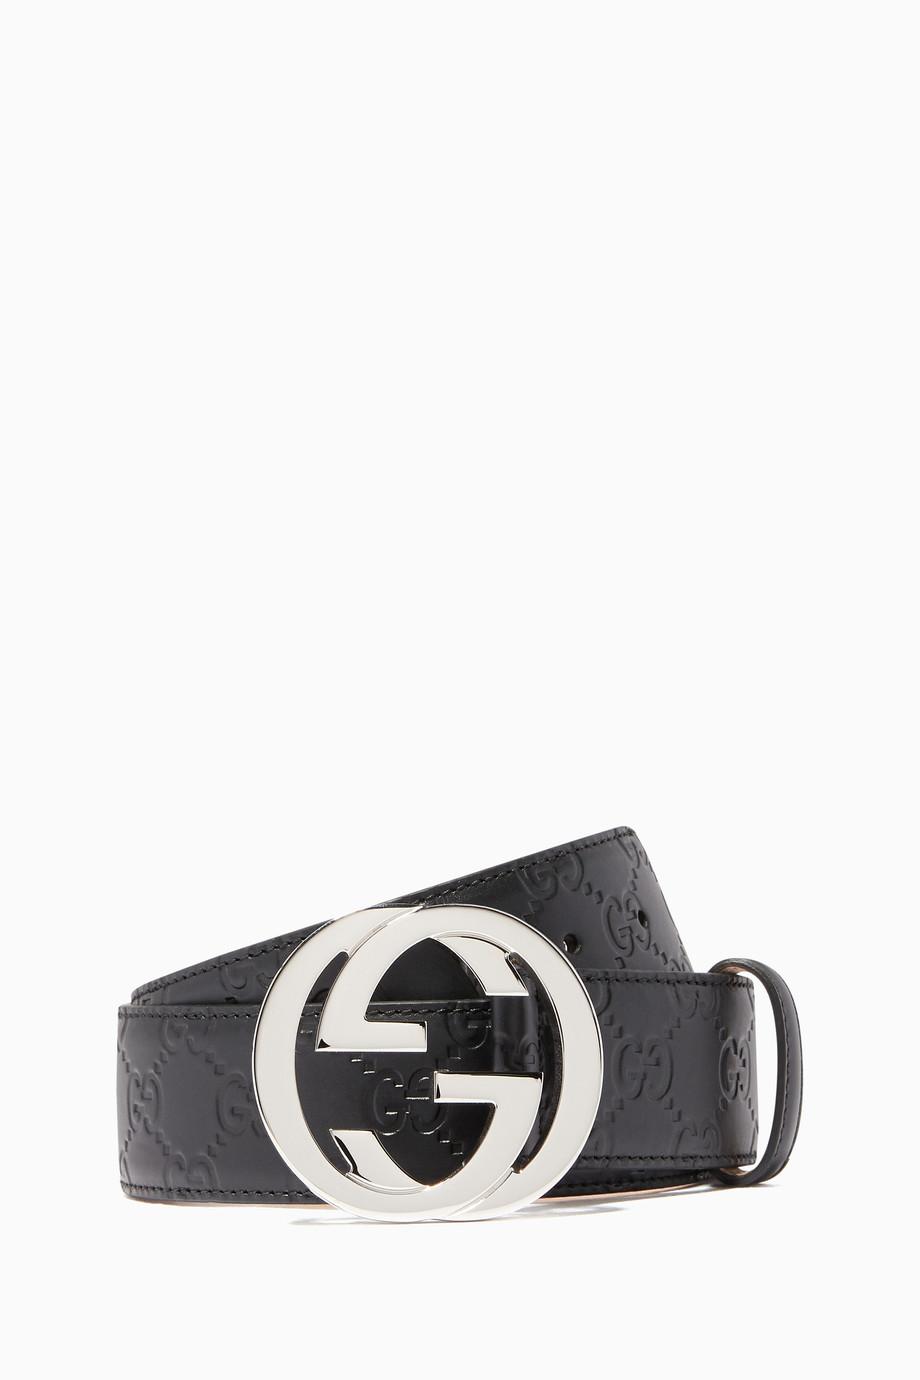 337a192a0 Black Signature Leather Belt Black Signature Leather Belt Black Signature  Leather Belt. Gucci